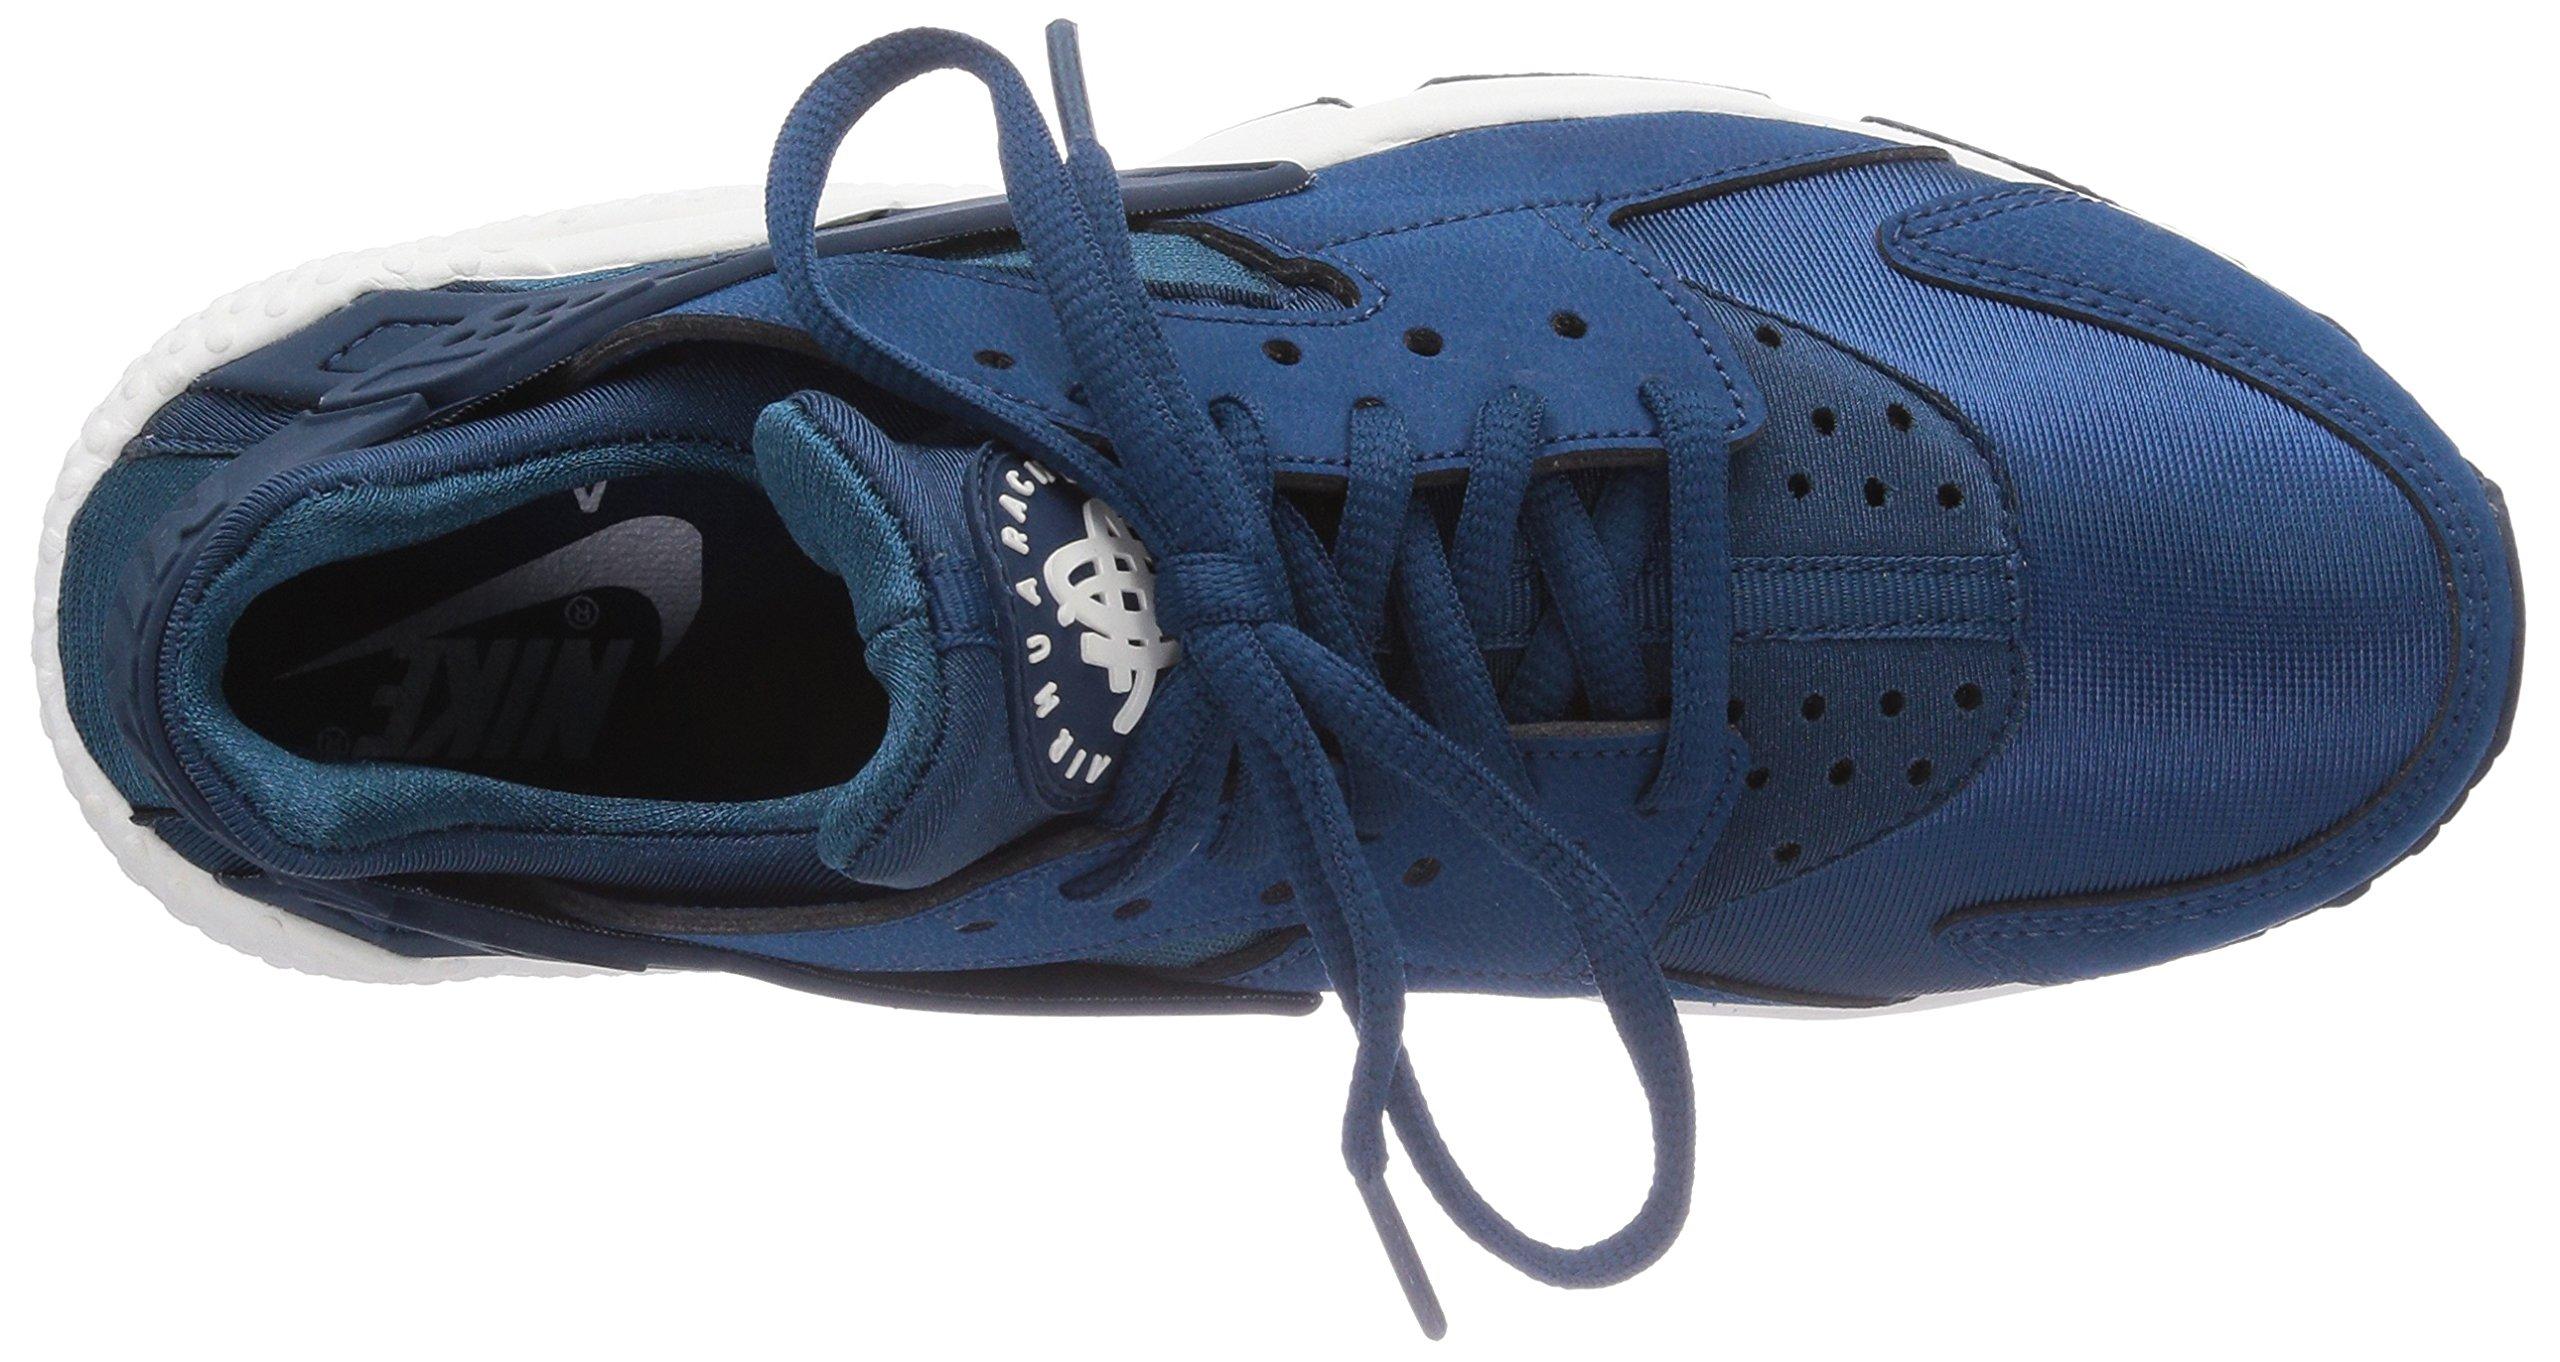 81plYytlvQL - Nike Women's Air Huarache Low-Top Trainer